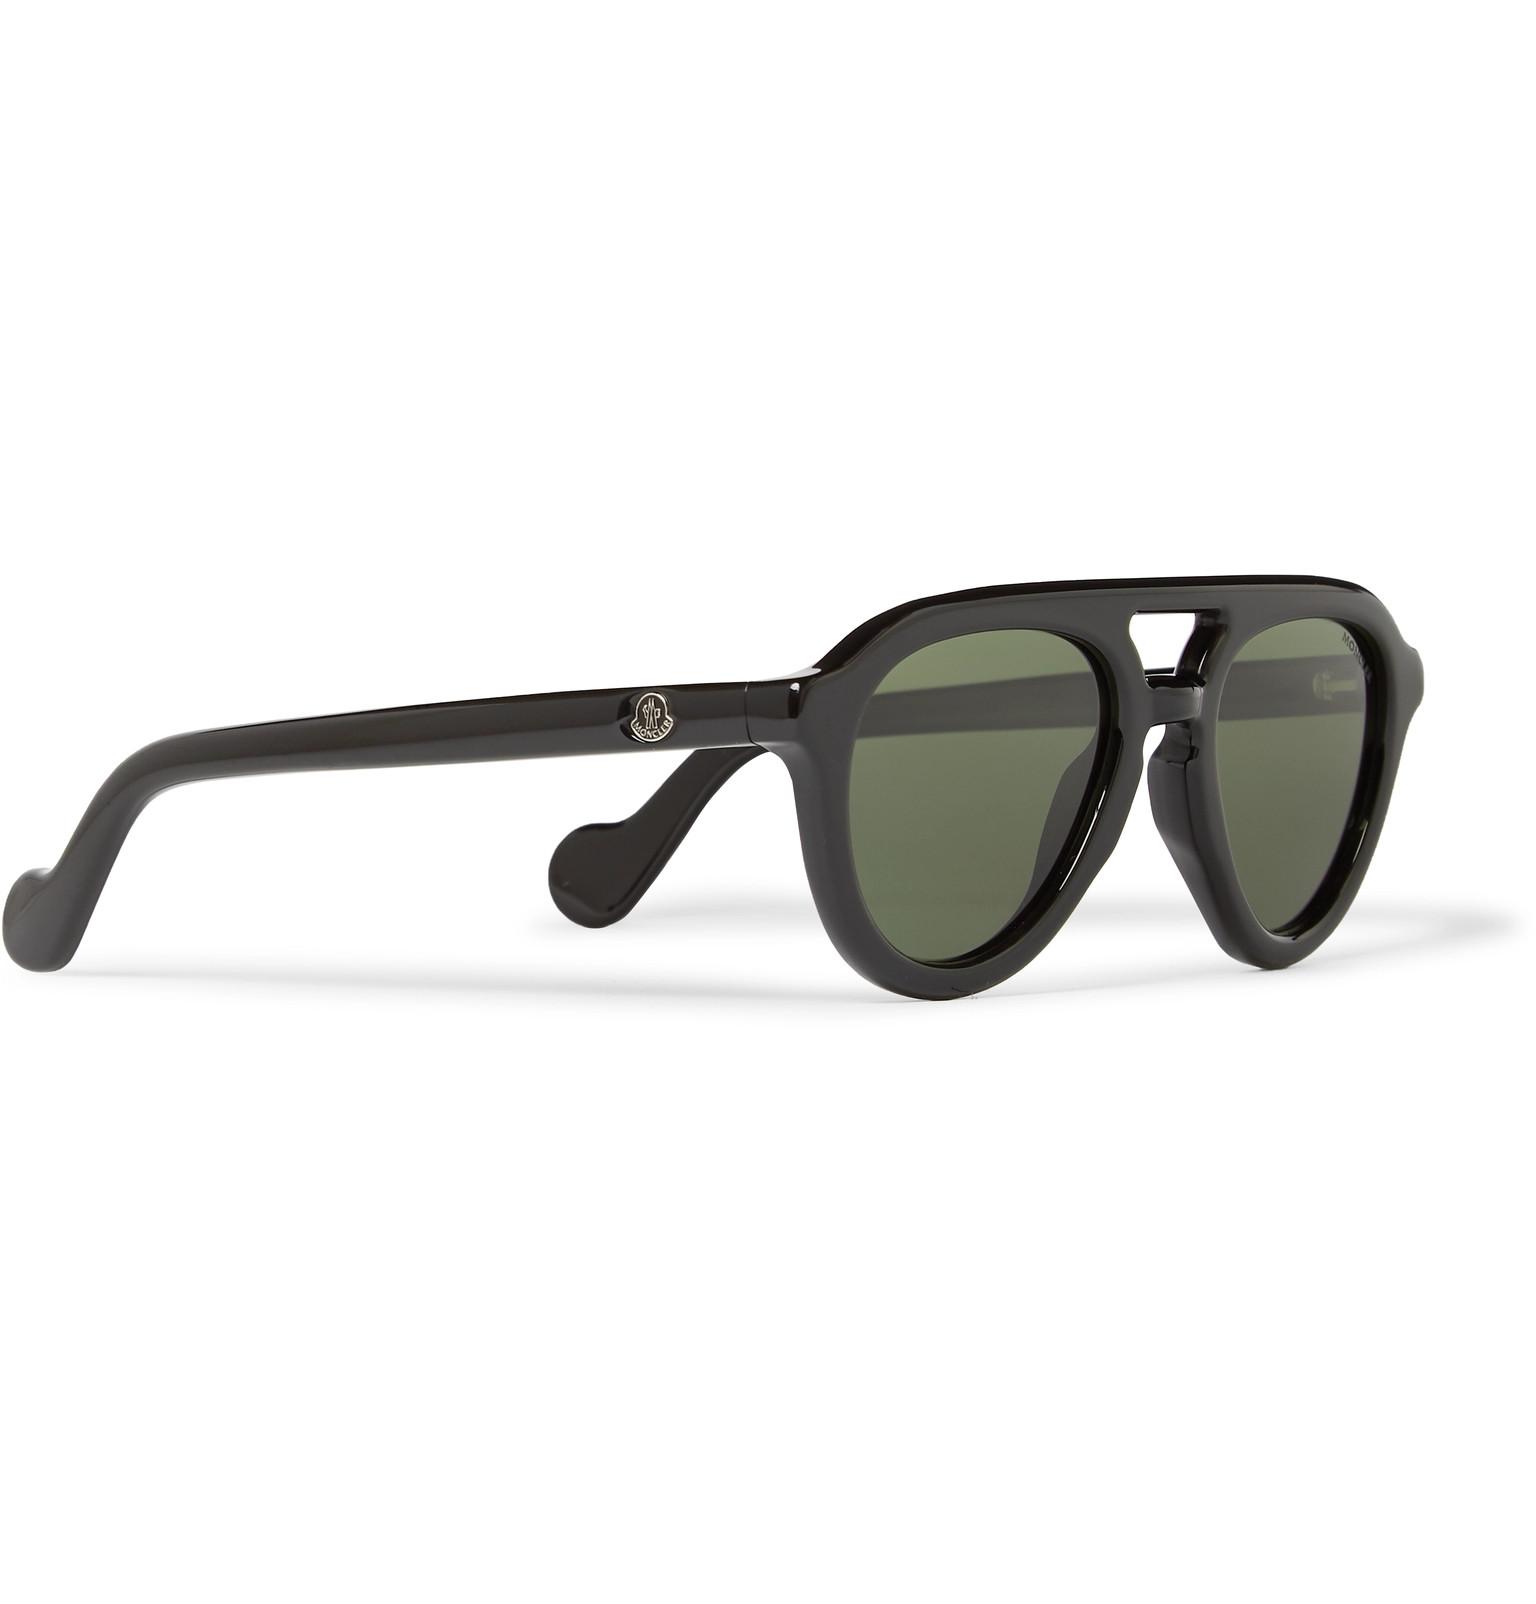 04f0d08d71 Moncler - Aviator-Style Acetate Polarised Sunglasses